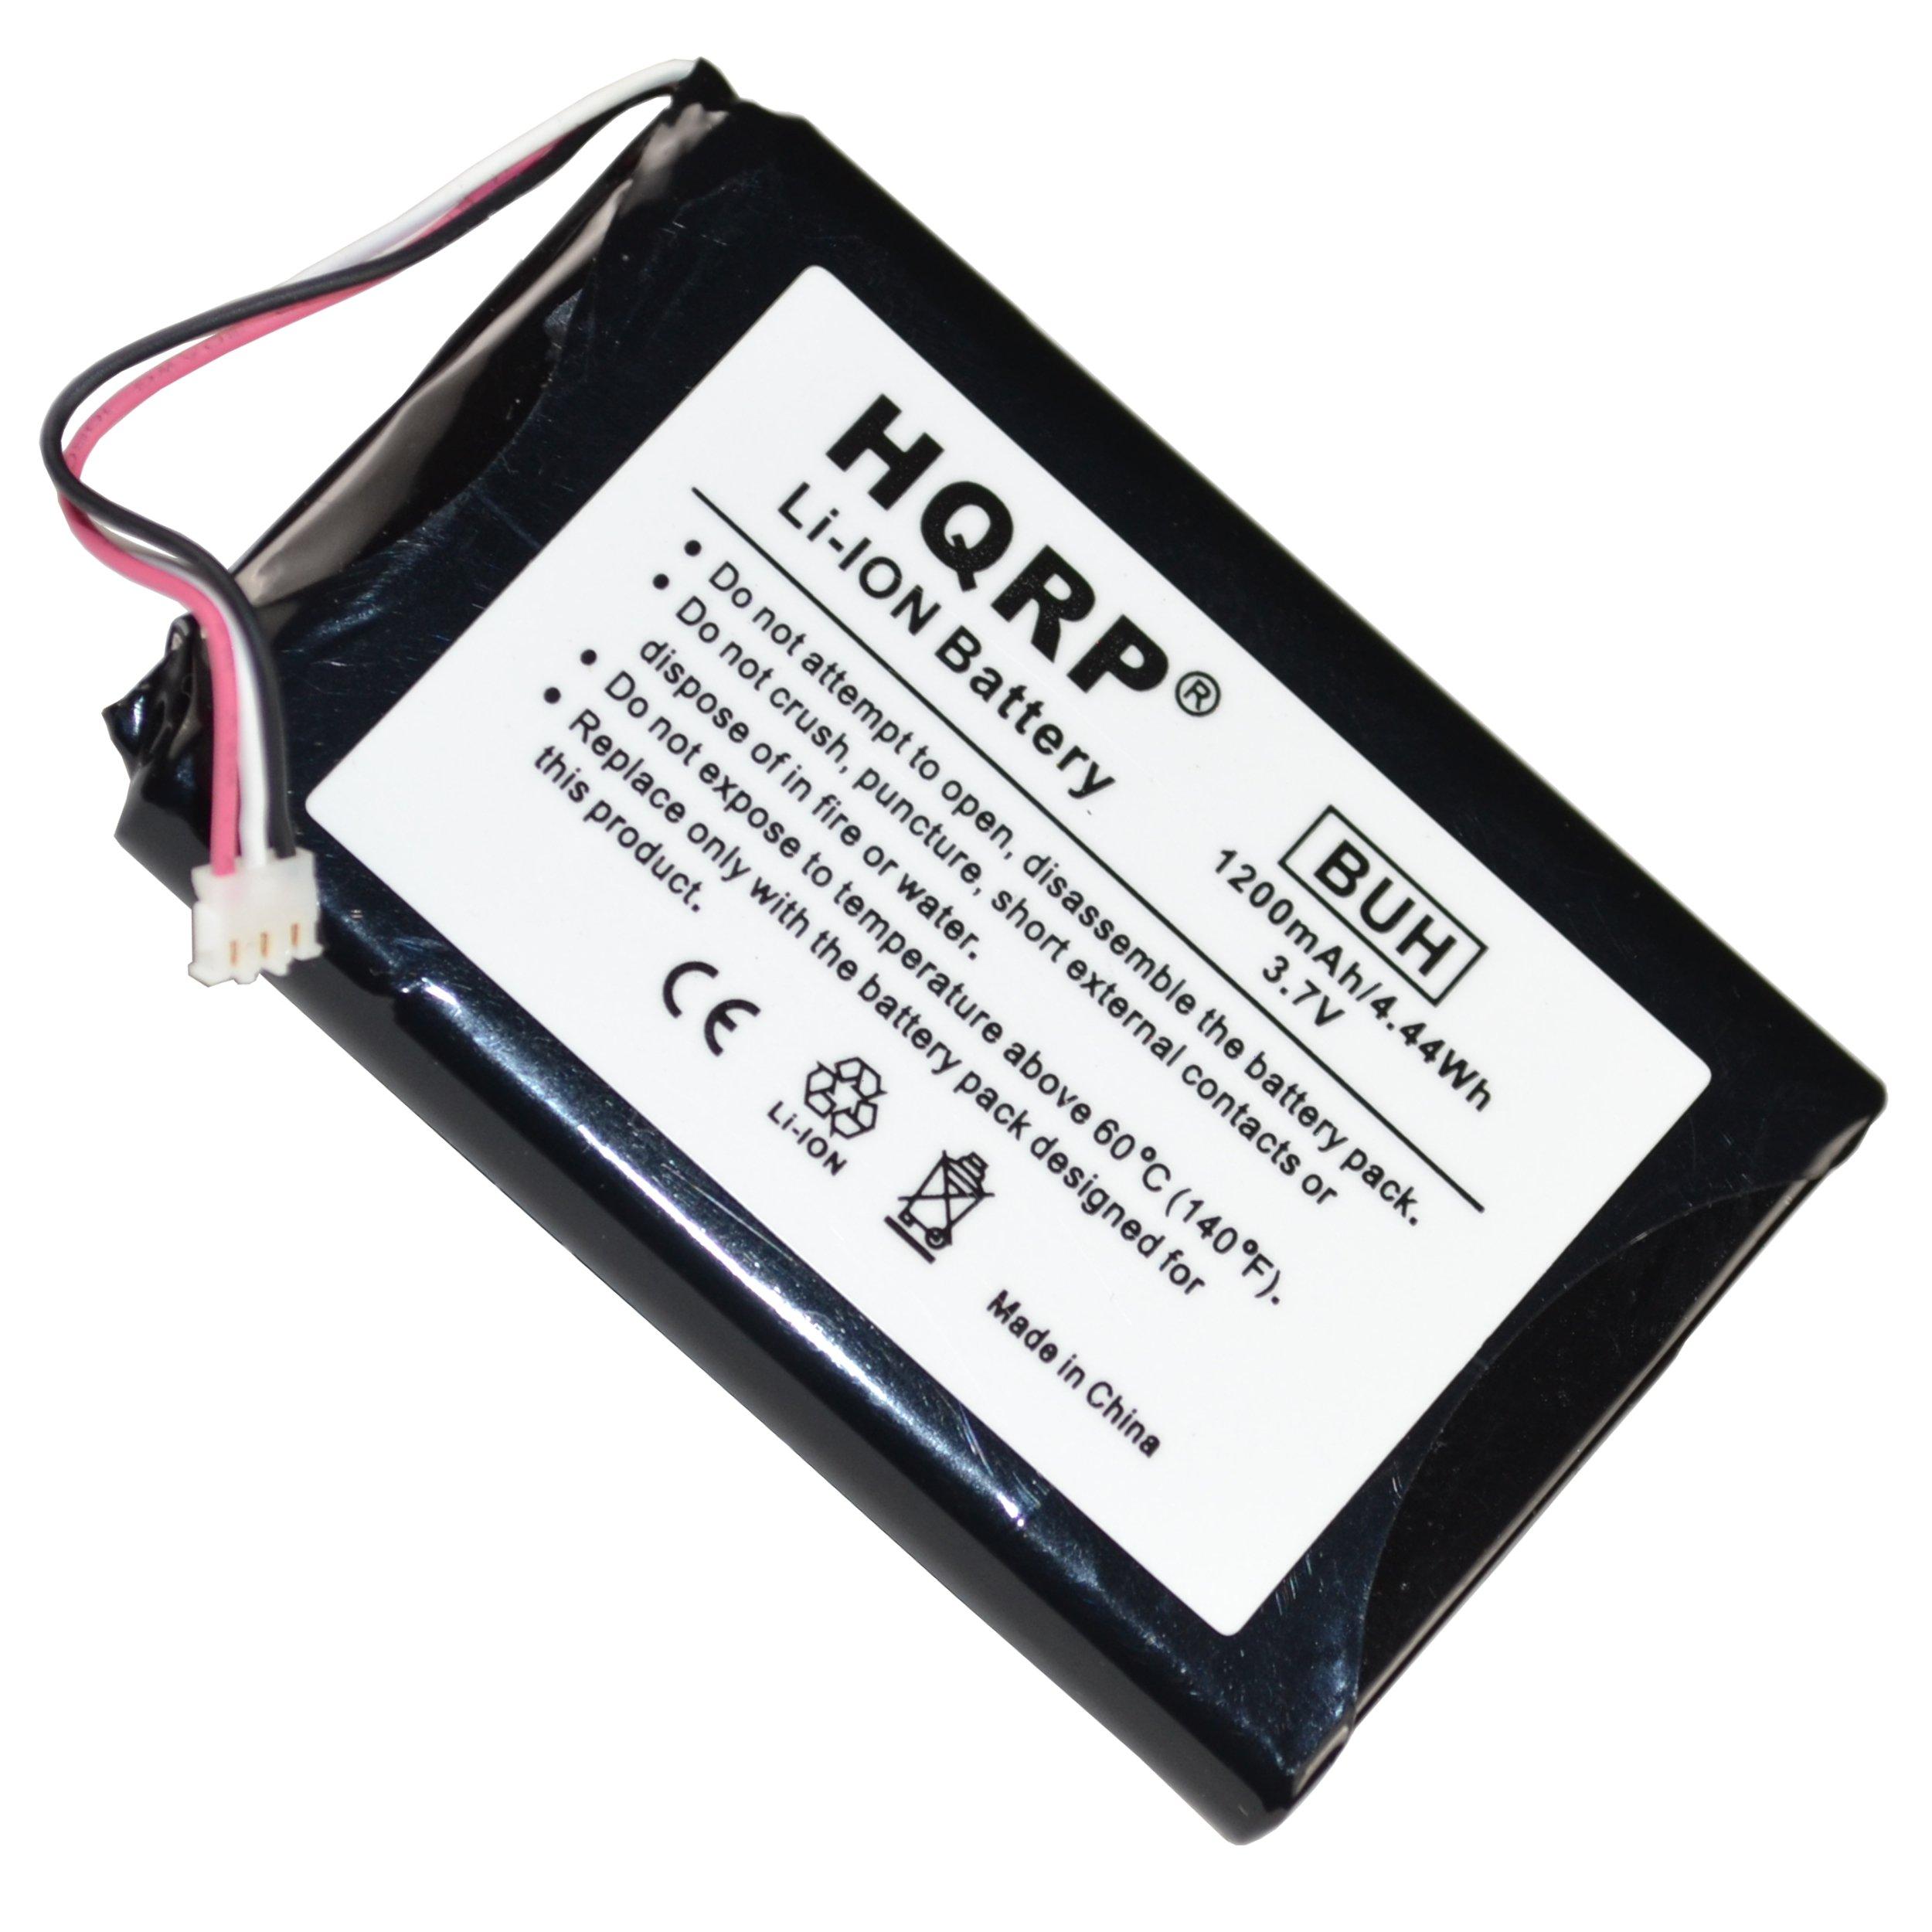 Bateria Para Garmin 361-00035-03 Nuvi 2450 2450LMT 2455 2455